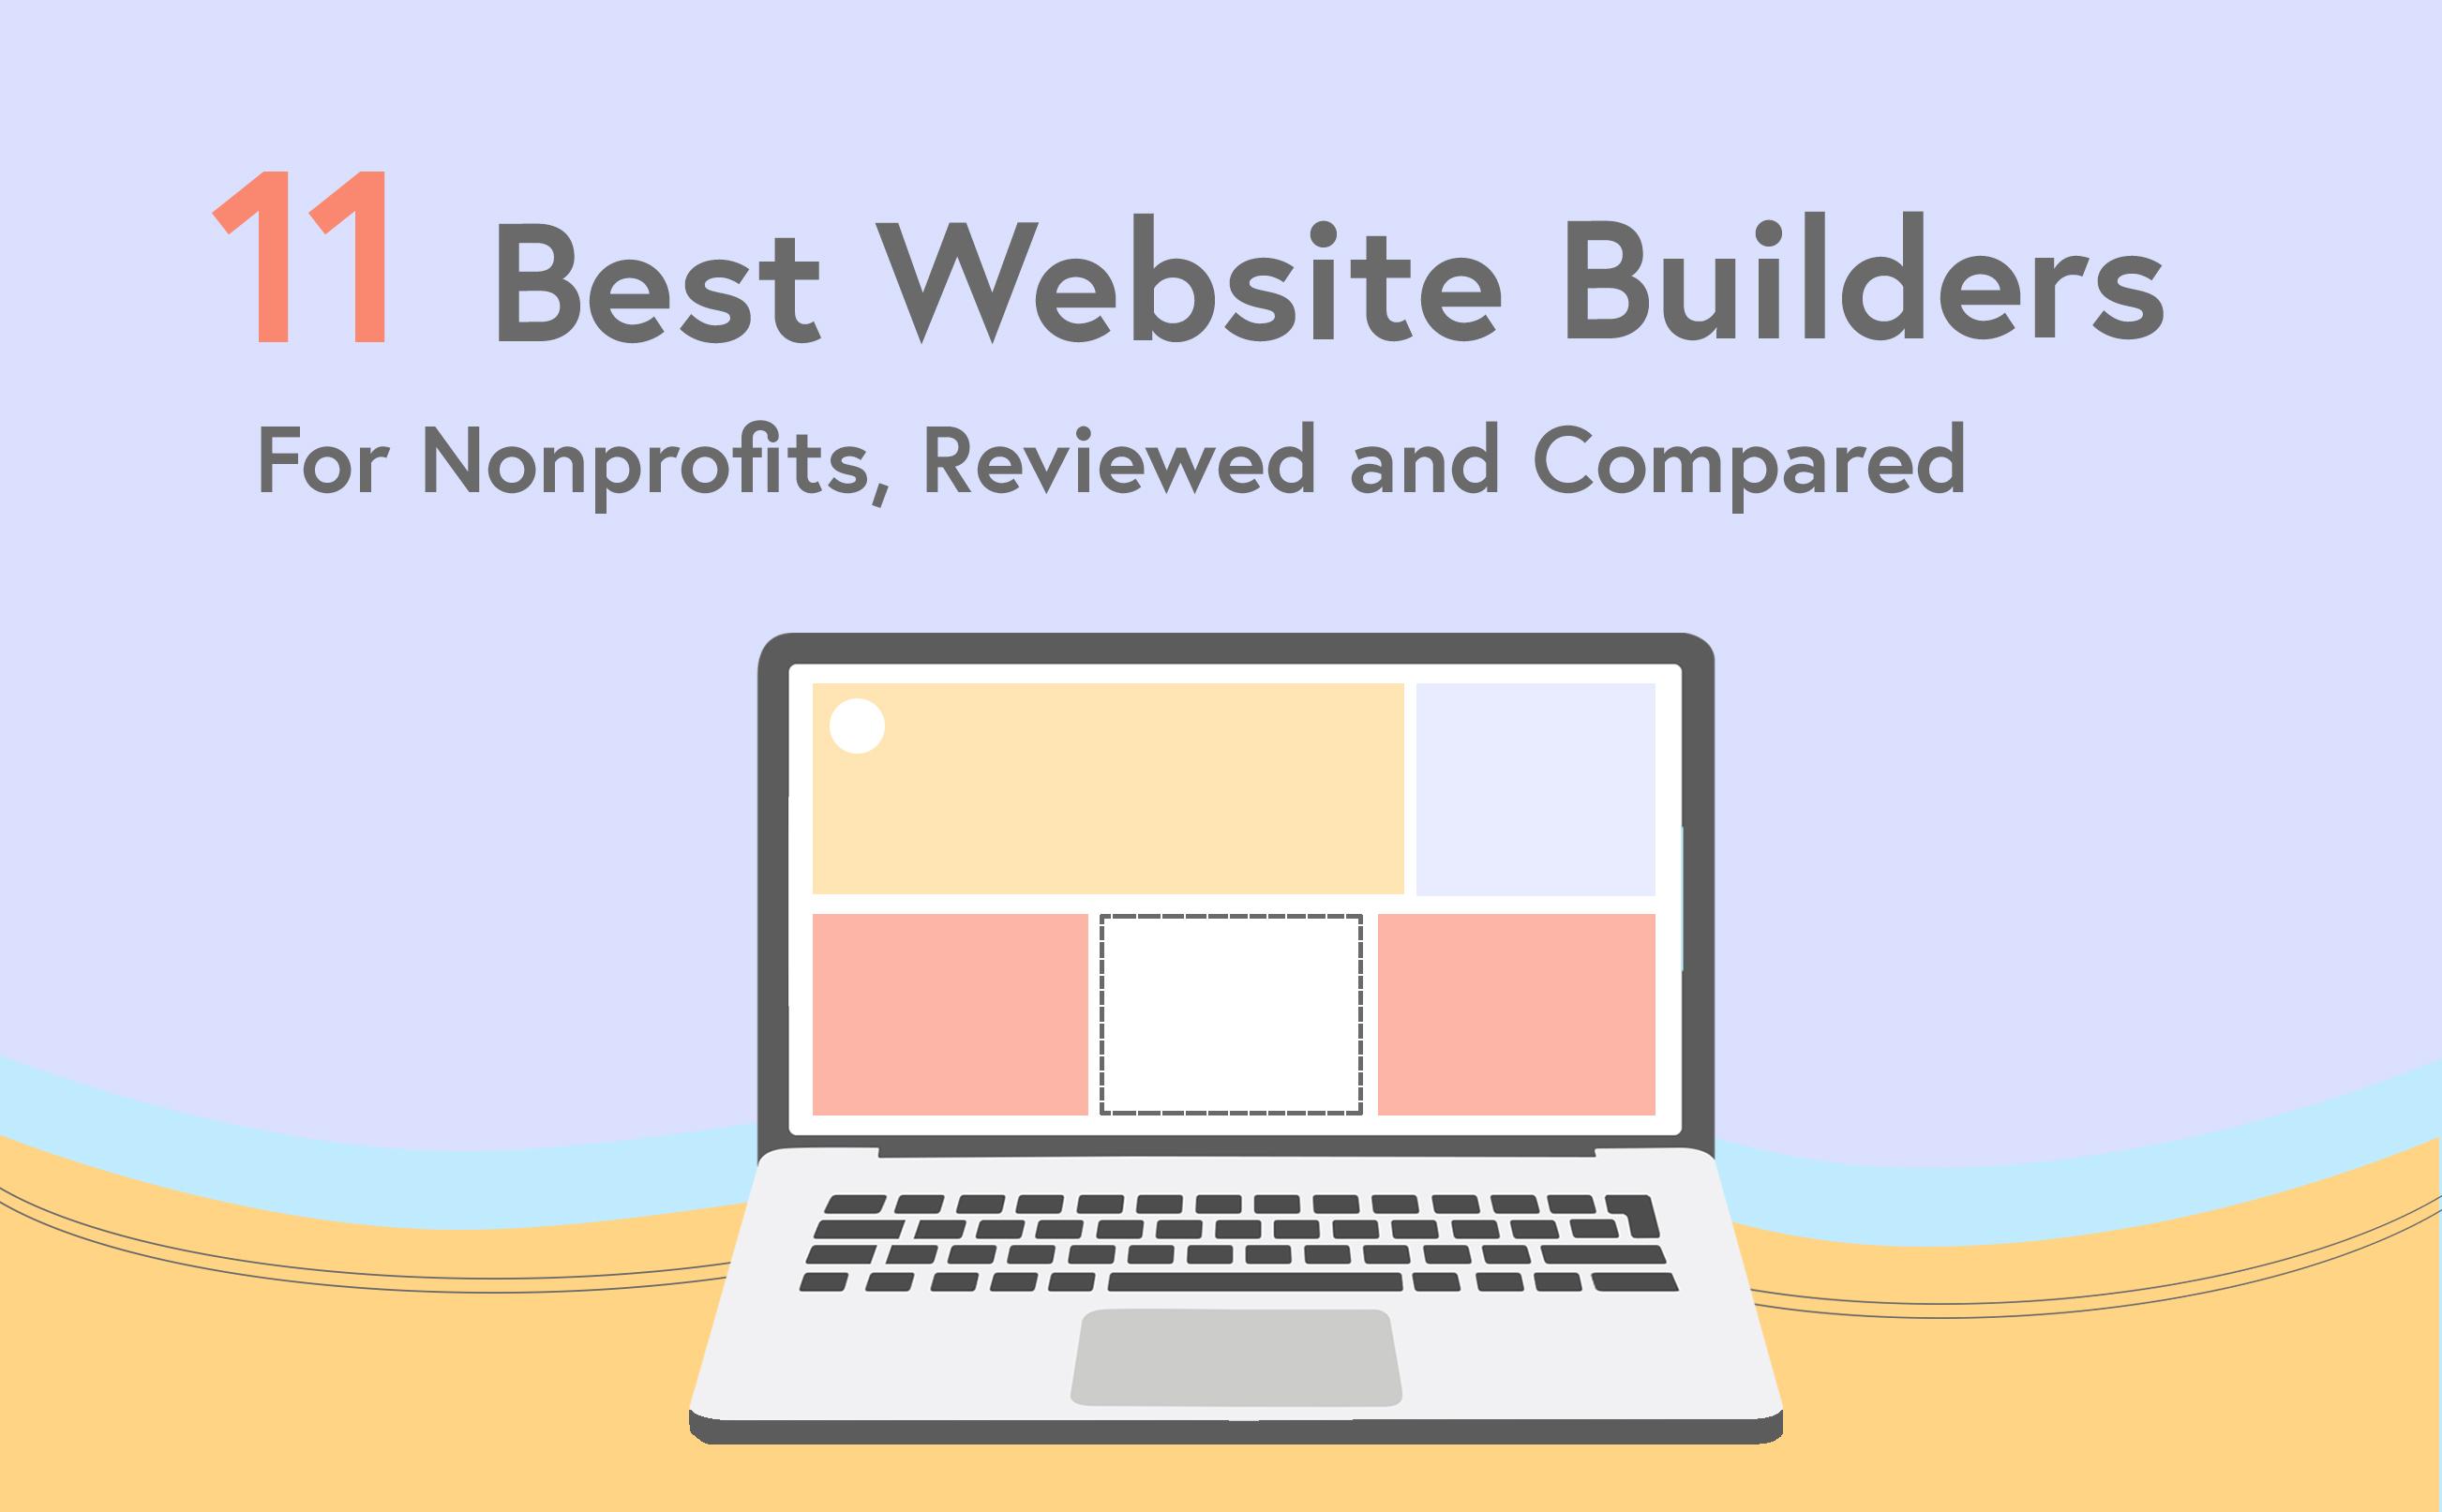 Best Nonprofit Website Builder